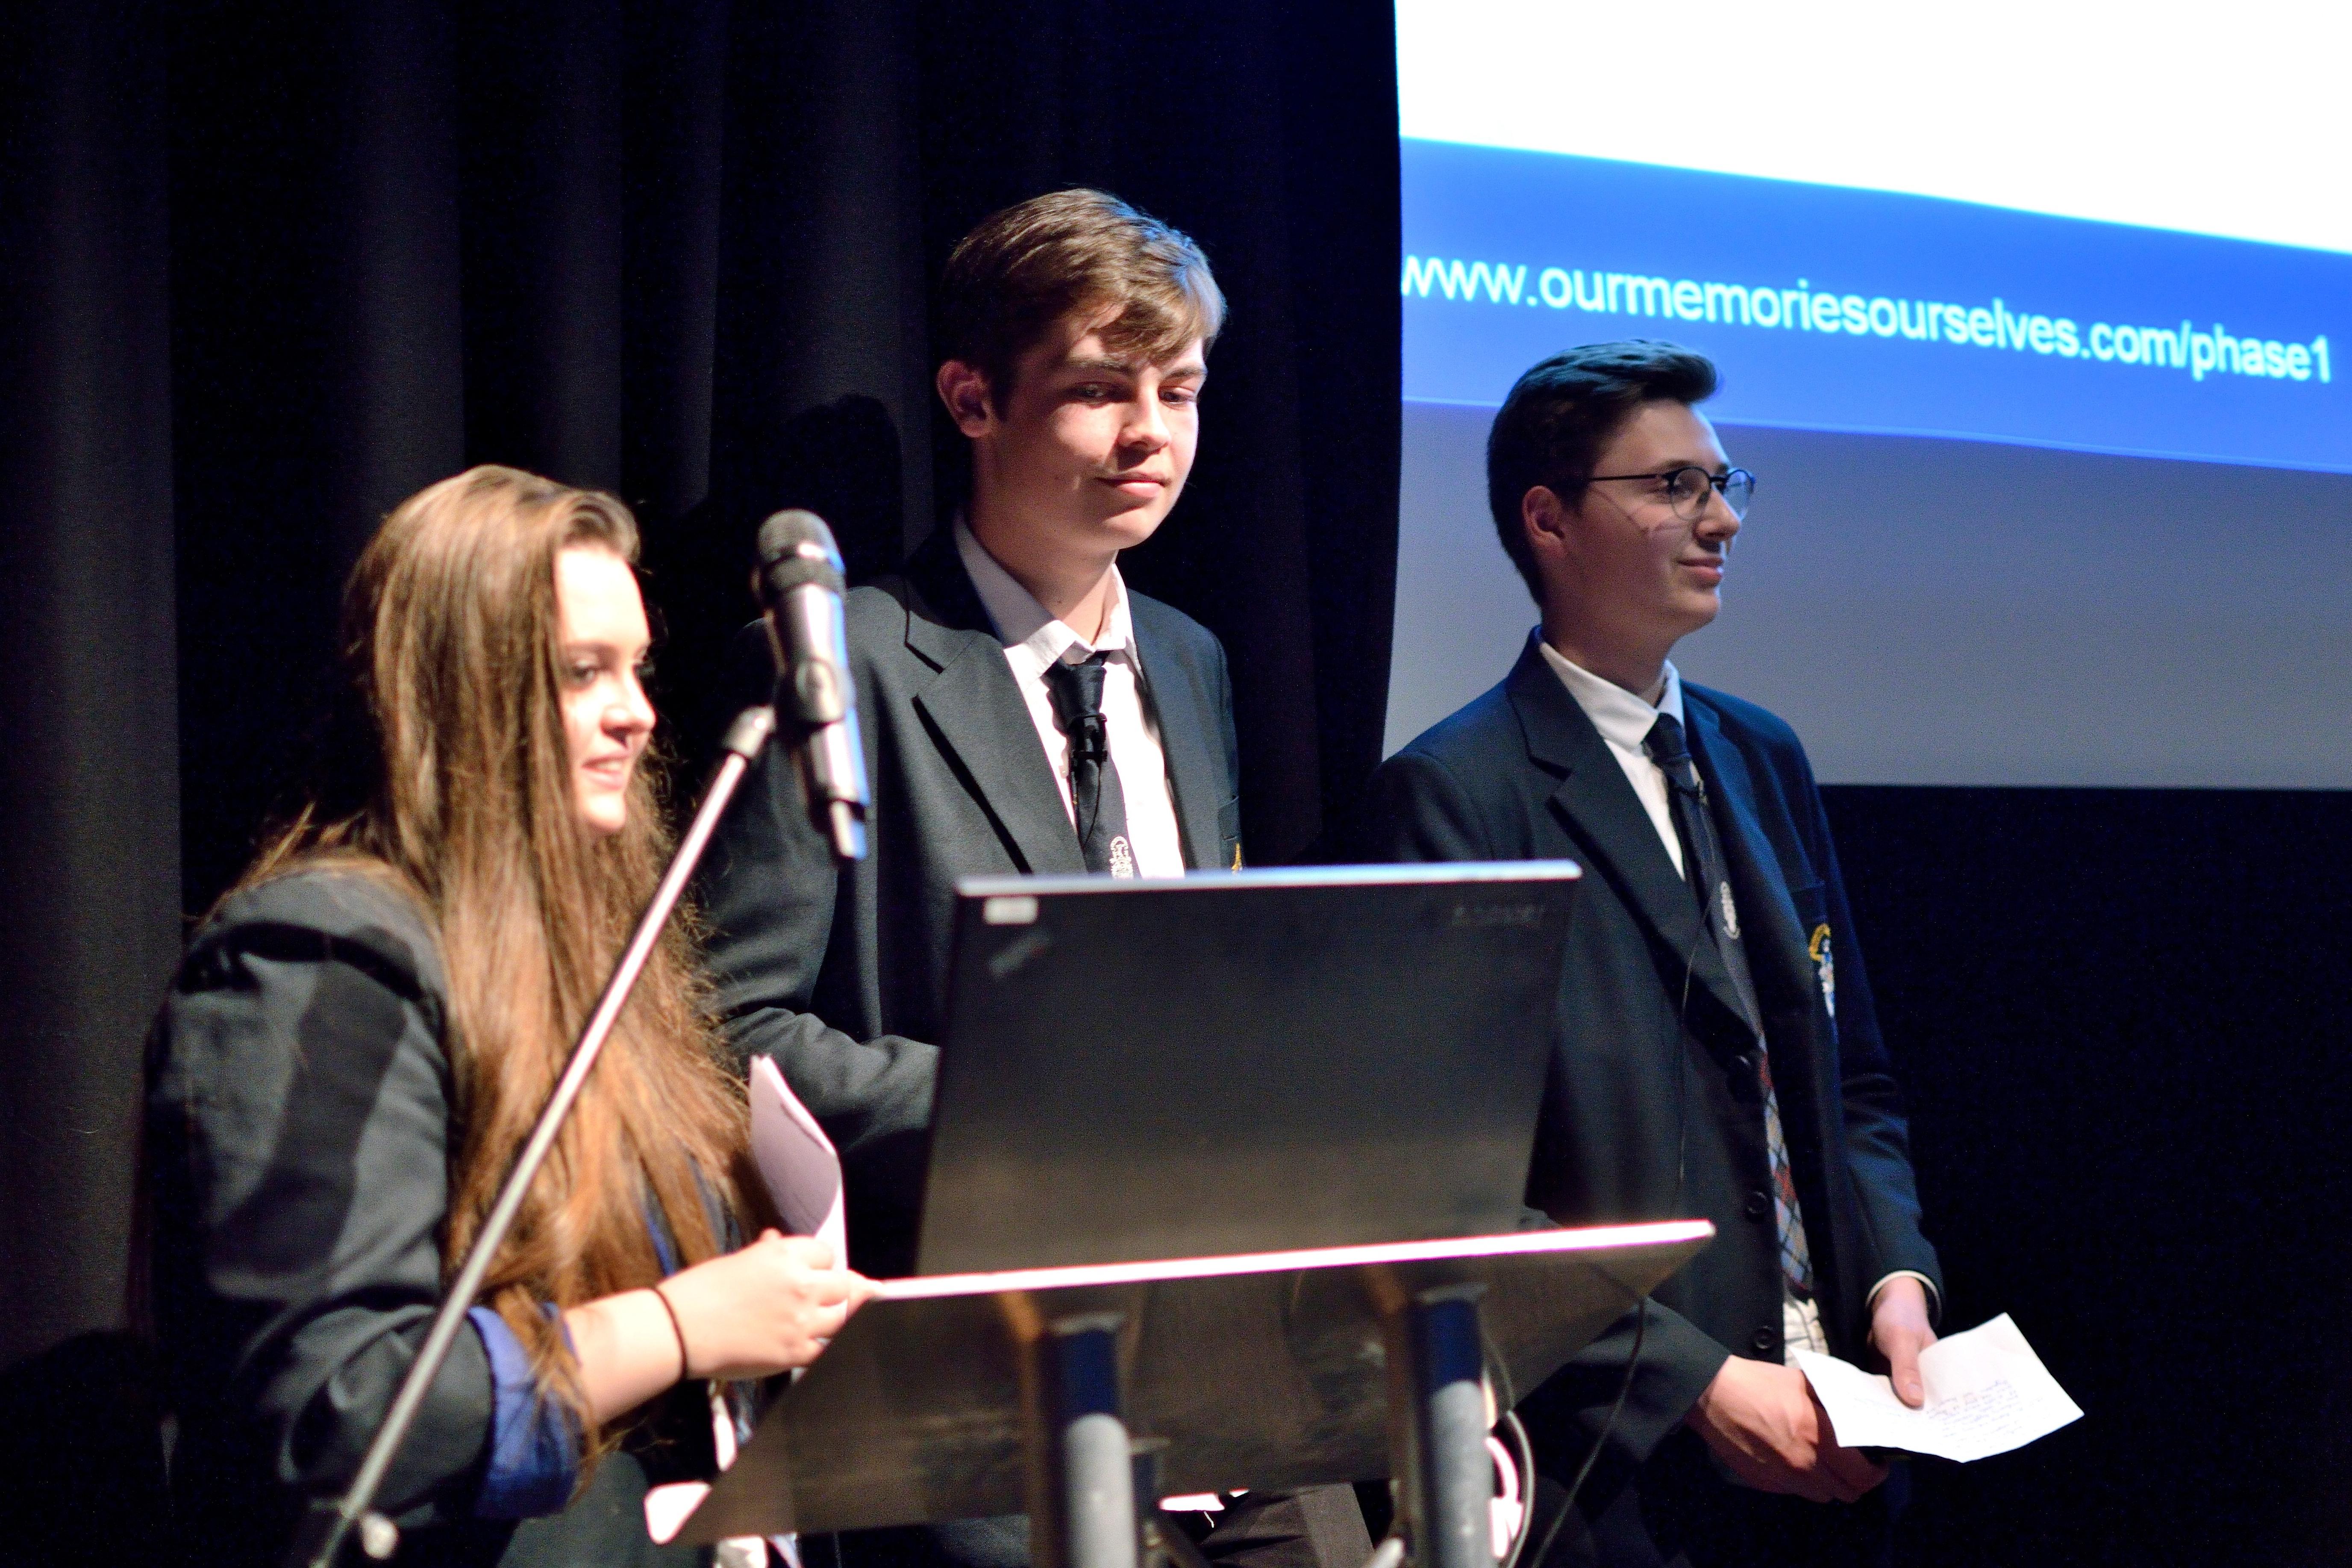 Group1 Presentation